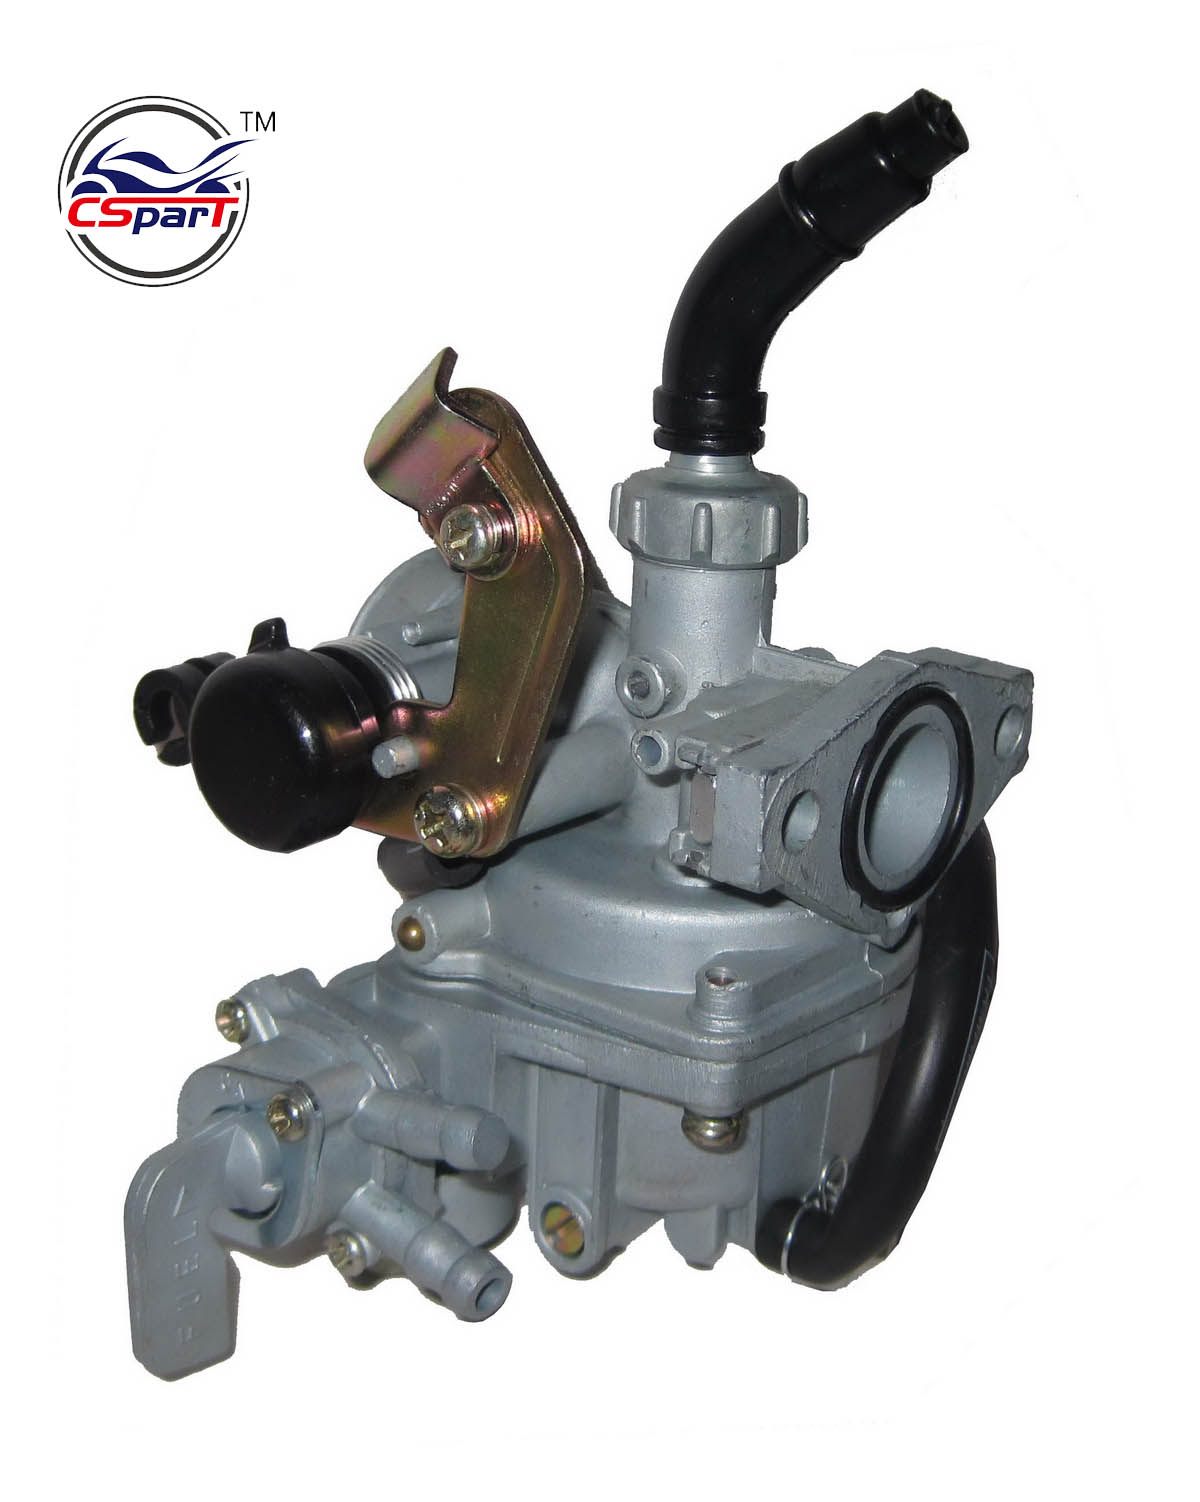 US $25 8 |17mm PZ17 Carb Carburetor Cable Chock Fuel Value For Honda TRX 70  ATC70 CT70 C70 FOURTRAX Dirt Pit Bike ATV Quad Parts-in Carburetor from